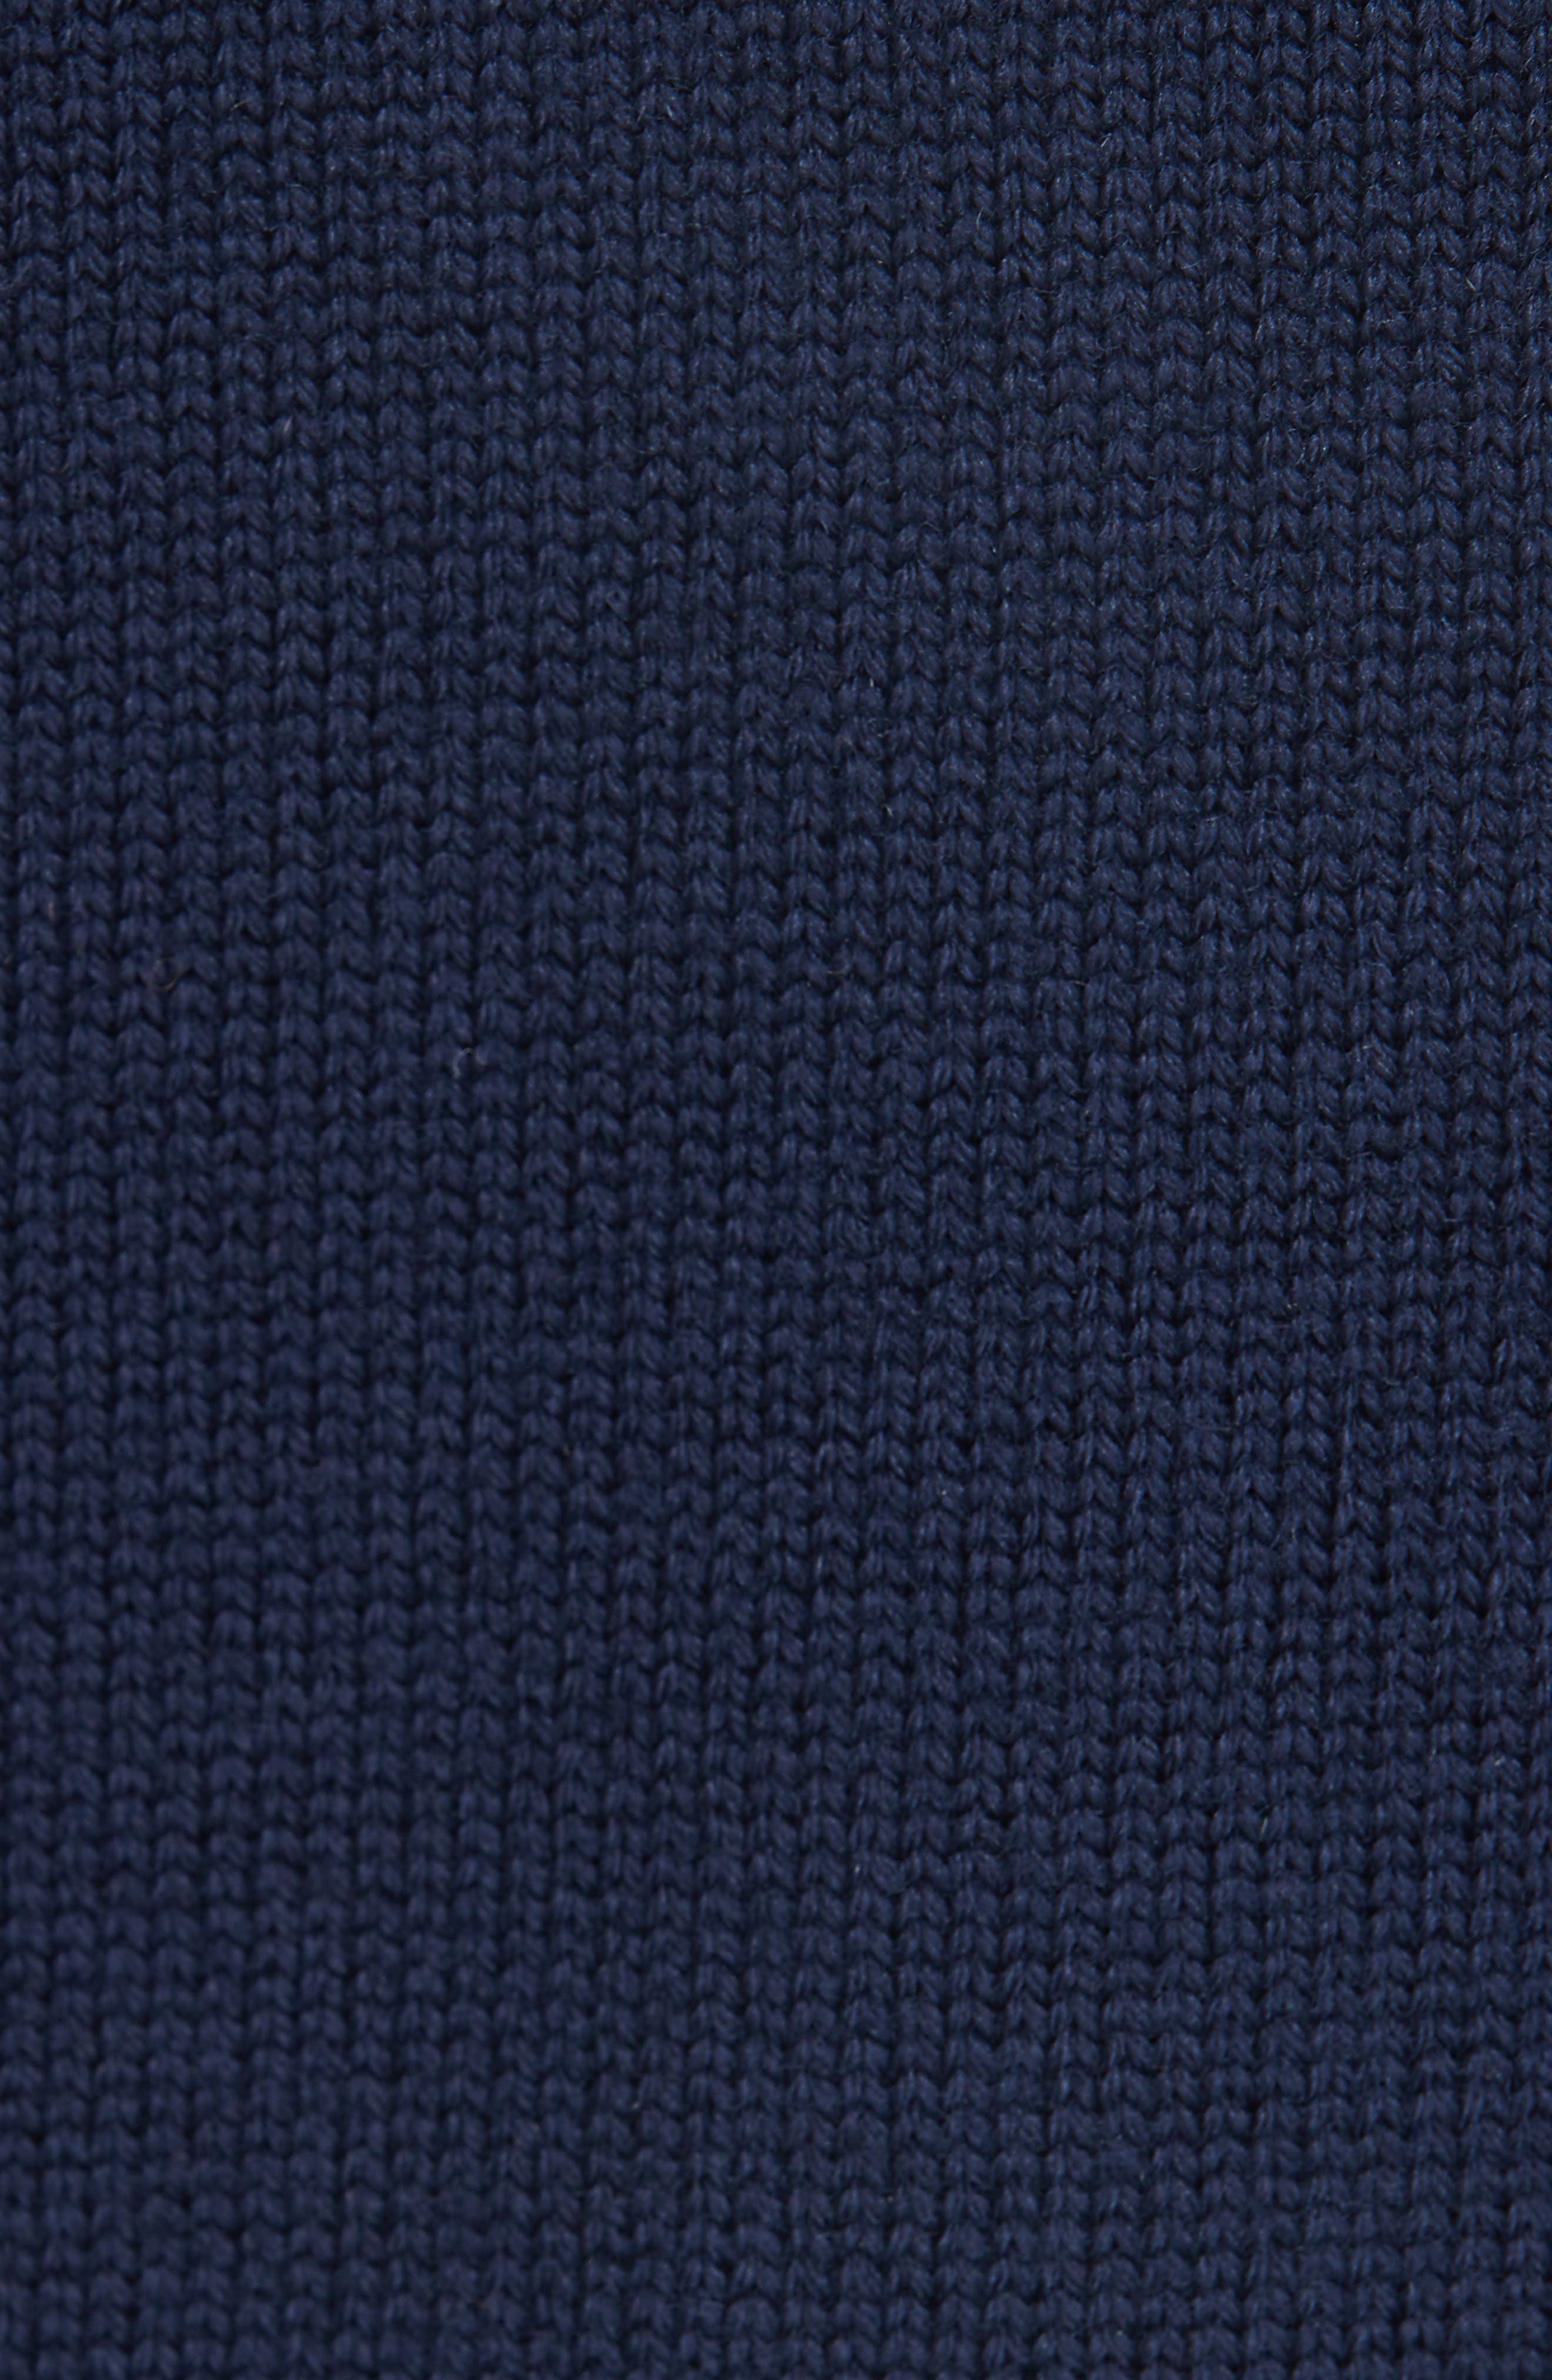 Wool Logo Cardigan,                             Alternate thumbnail 5, color,                             NAVY BLUE